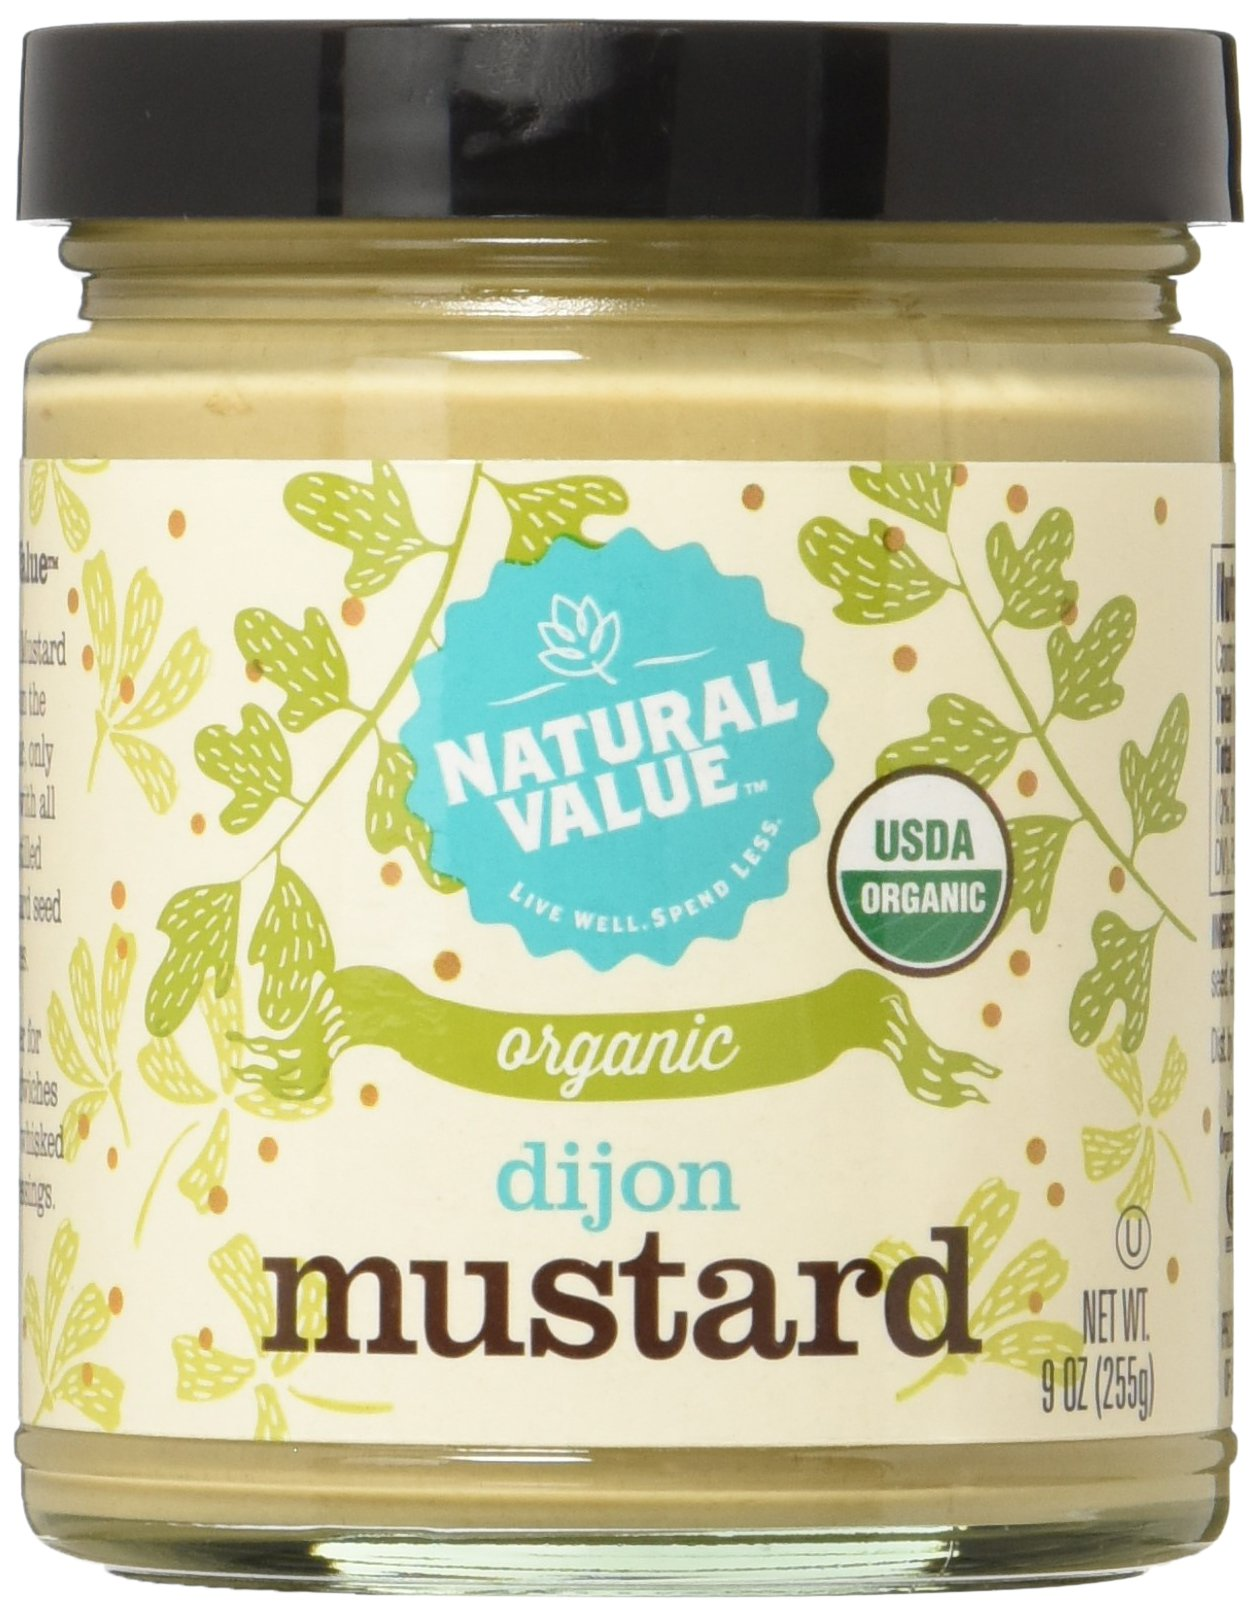 Natural Value Organic Dijon Mustard, 9 Ounce (Pack of 12)